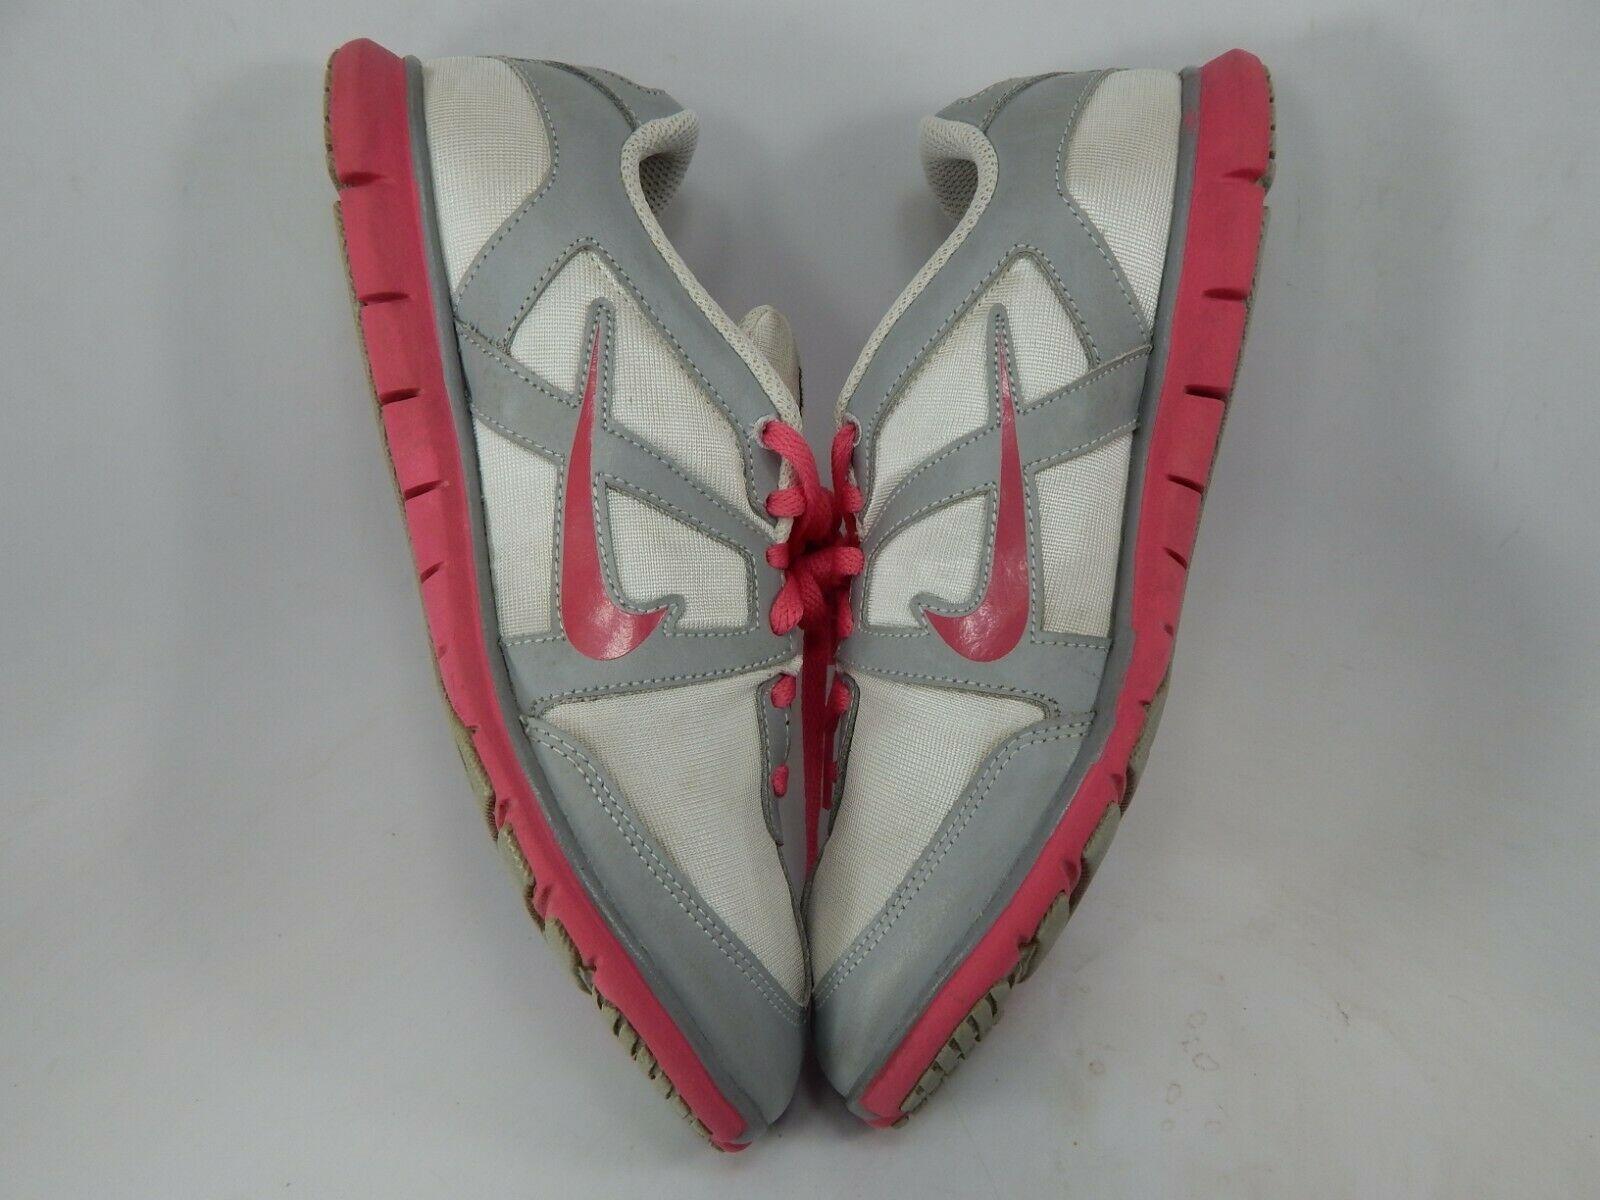 Nike Oceania NM Size 6.5 M (B) EU 37.5 Women's Sneakers Shoes White 677136-610